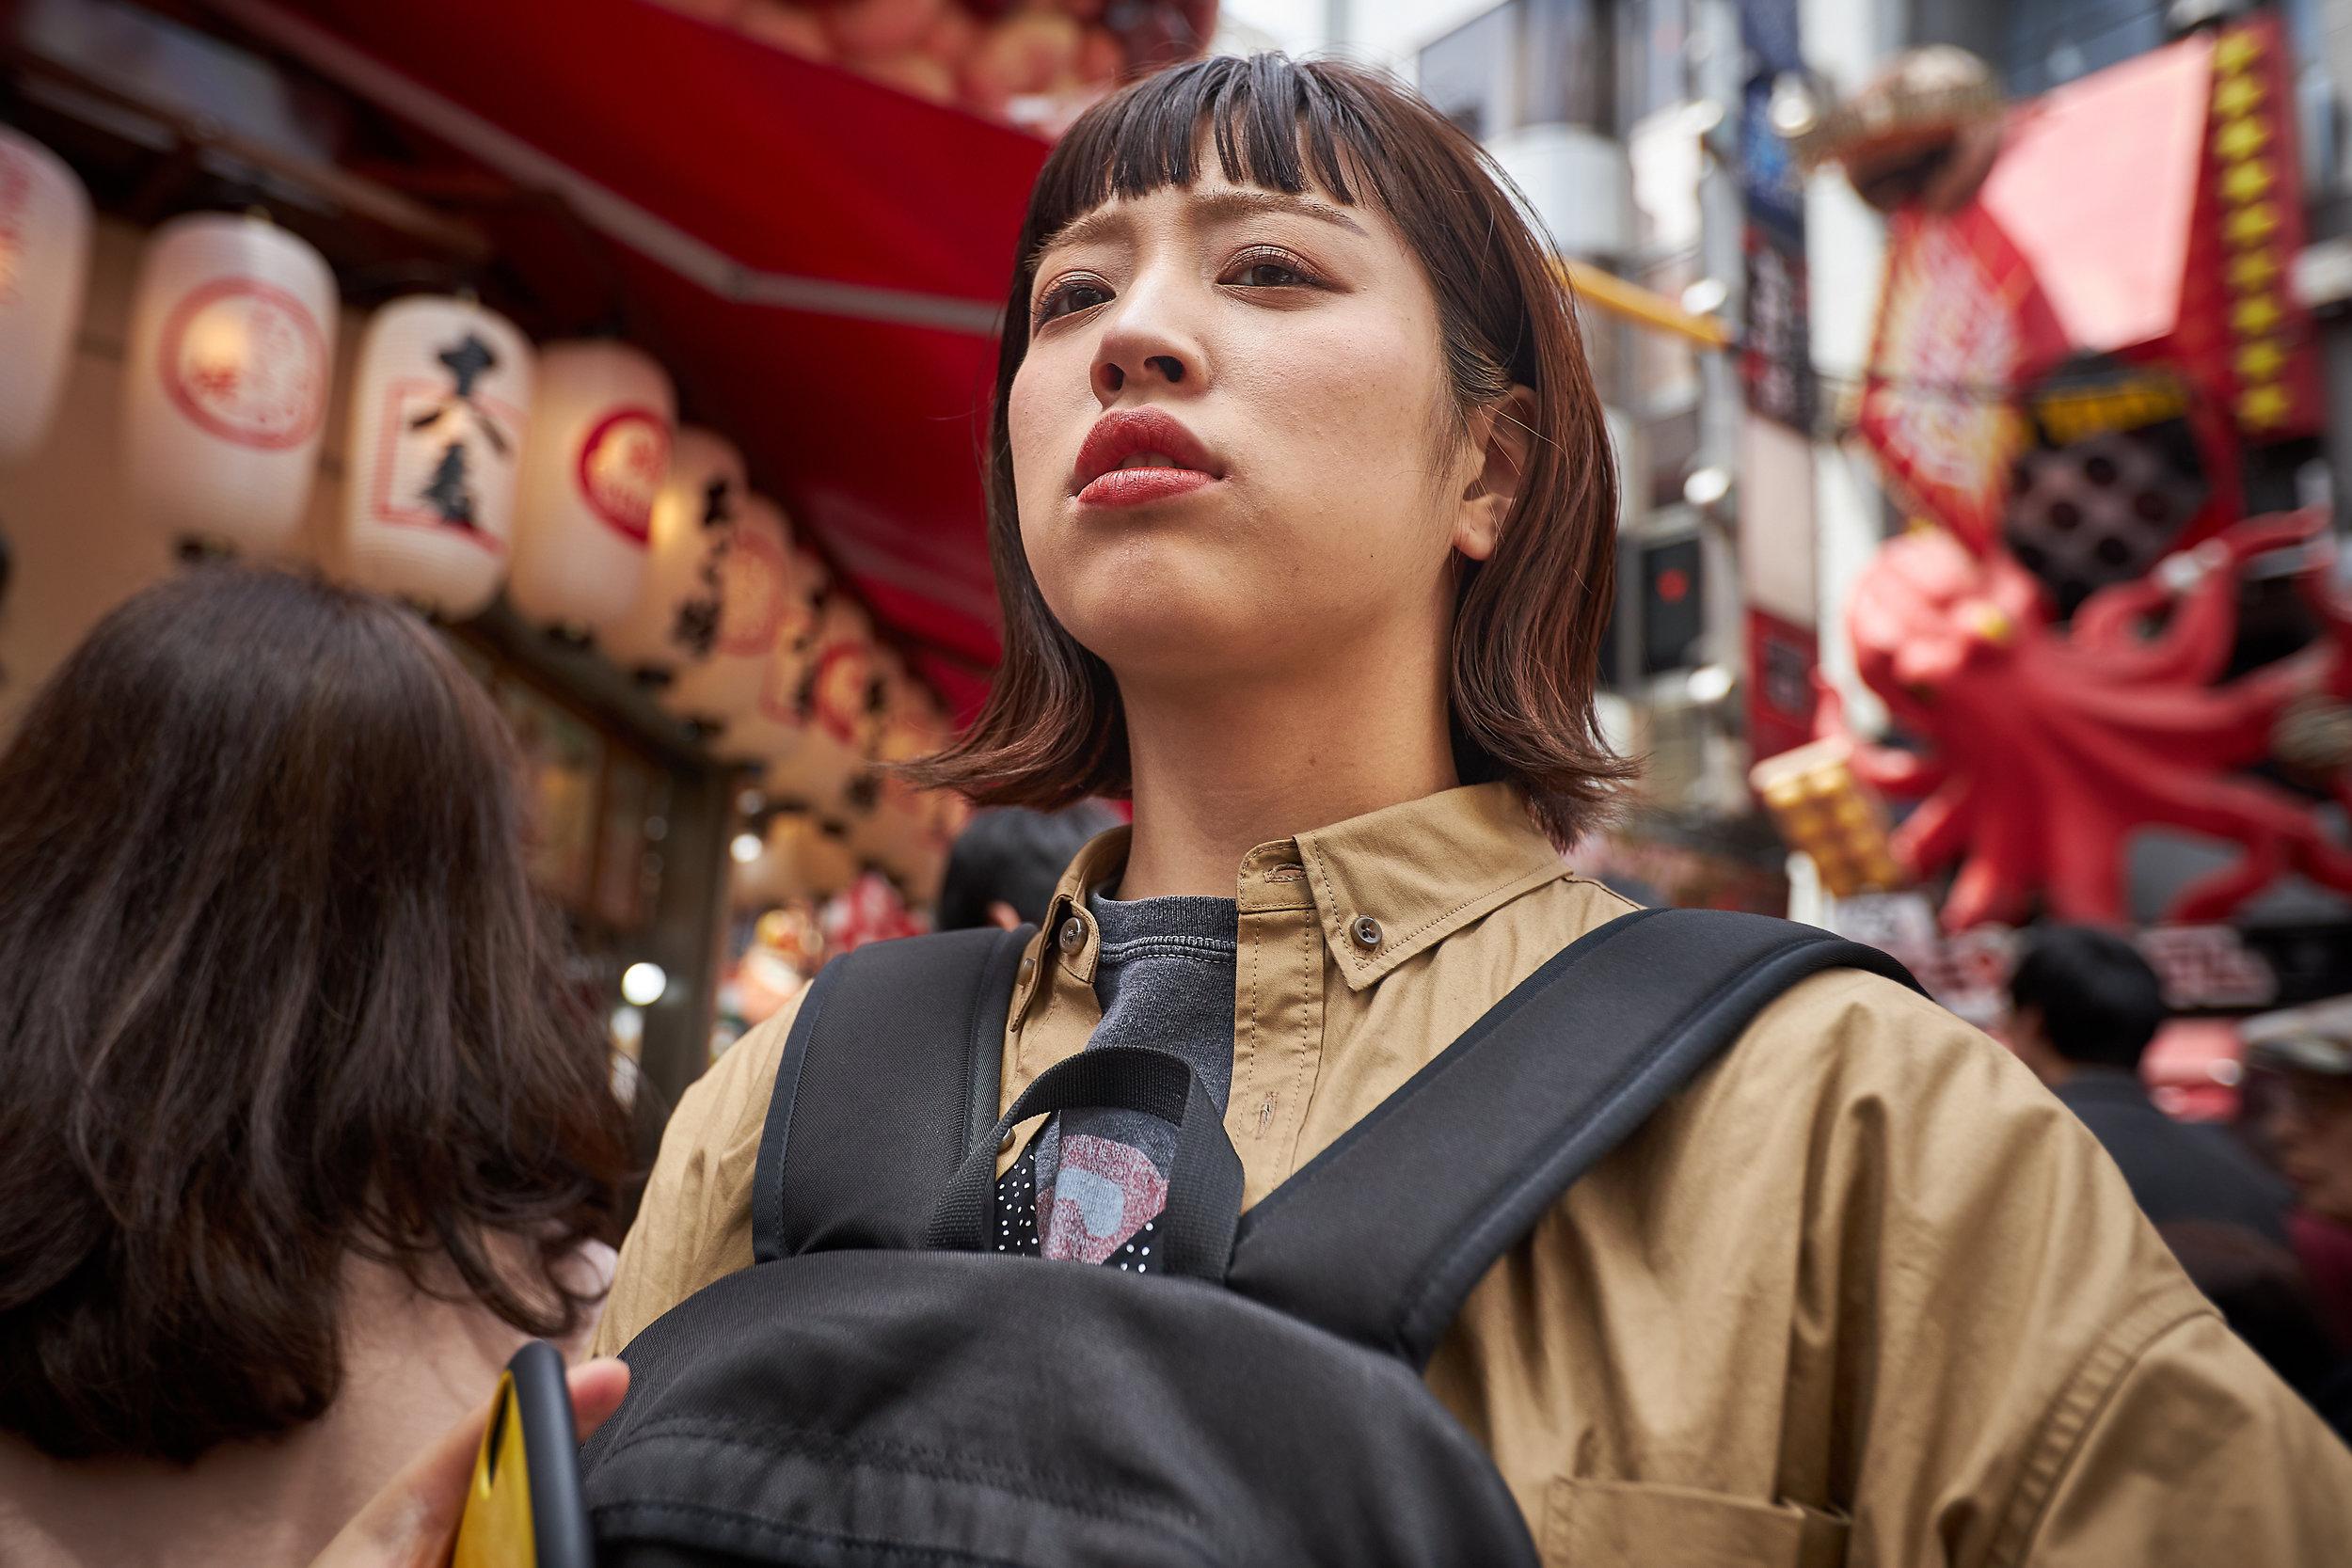 Markt_japan_websiet.jpg